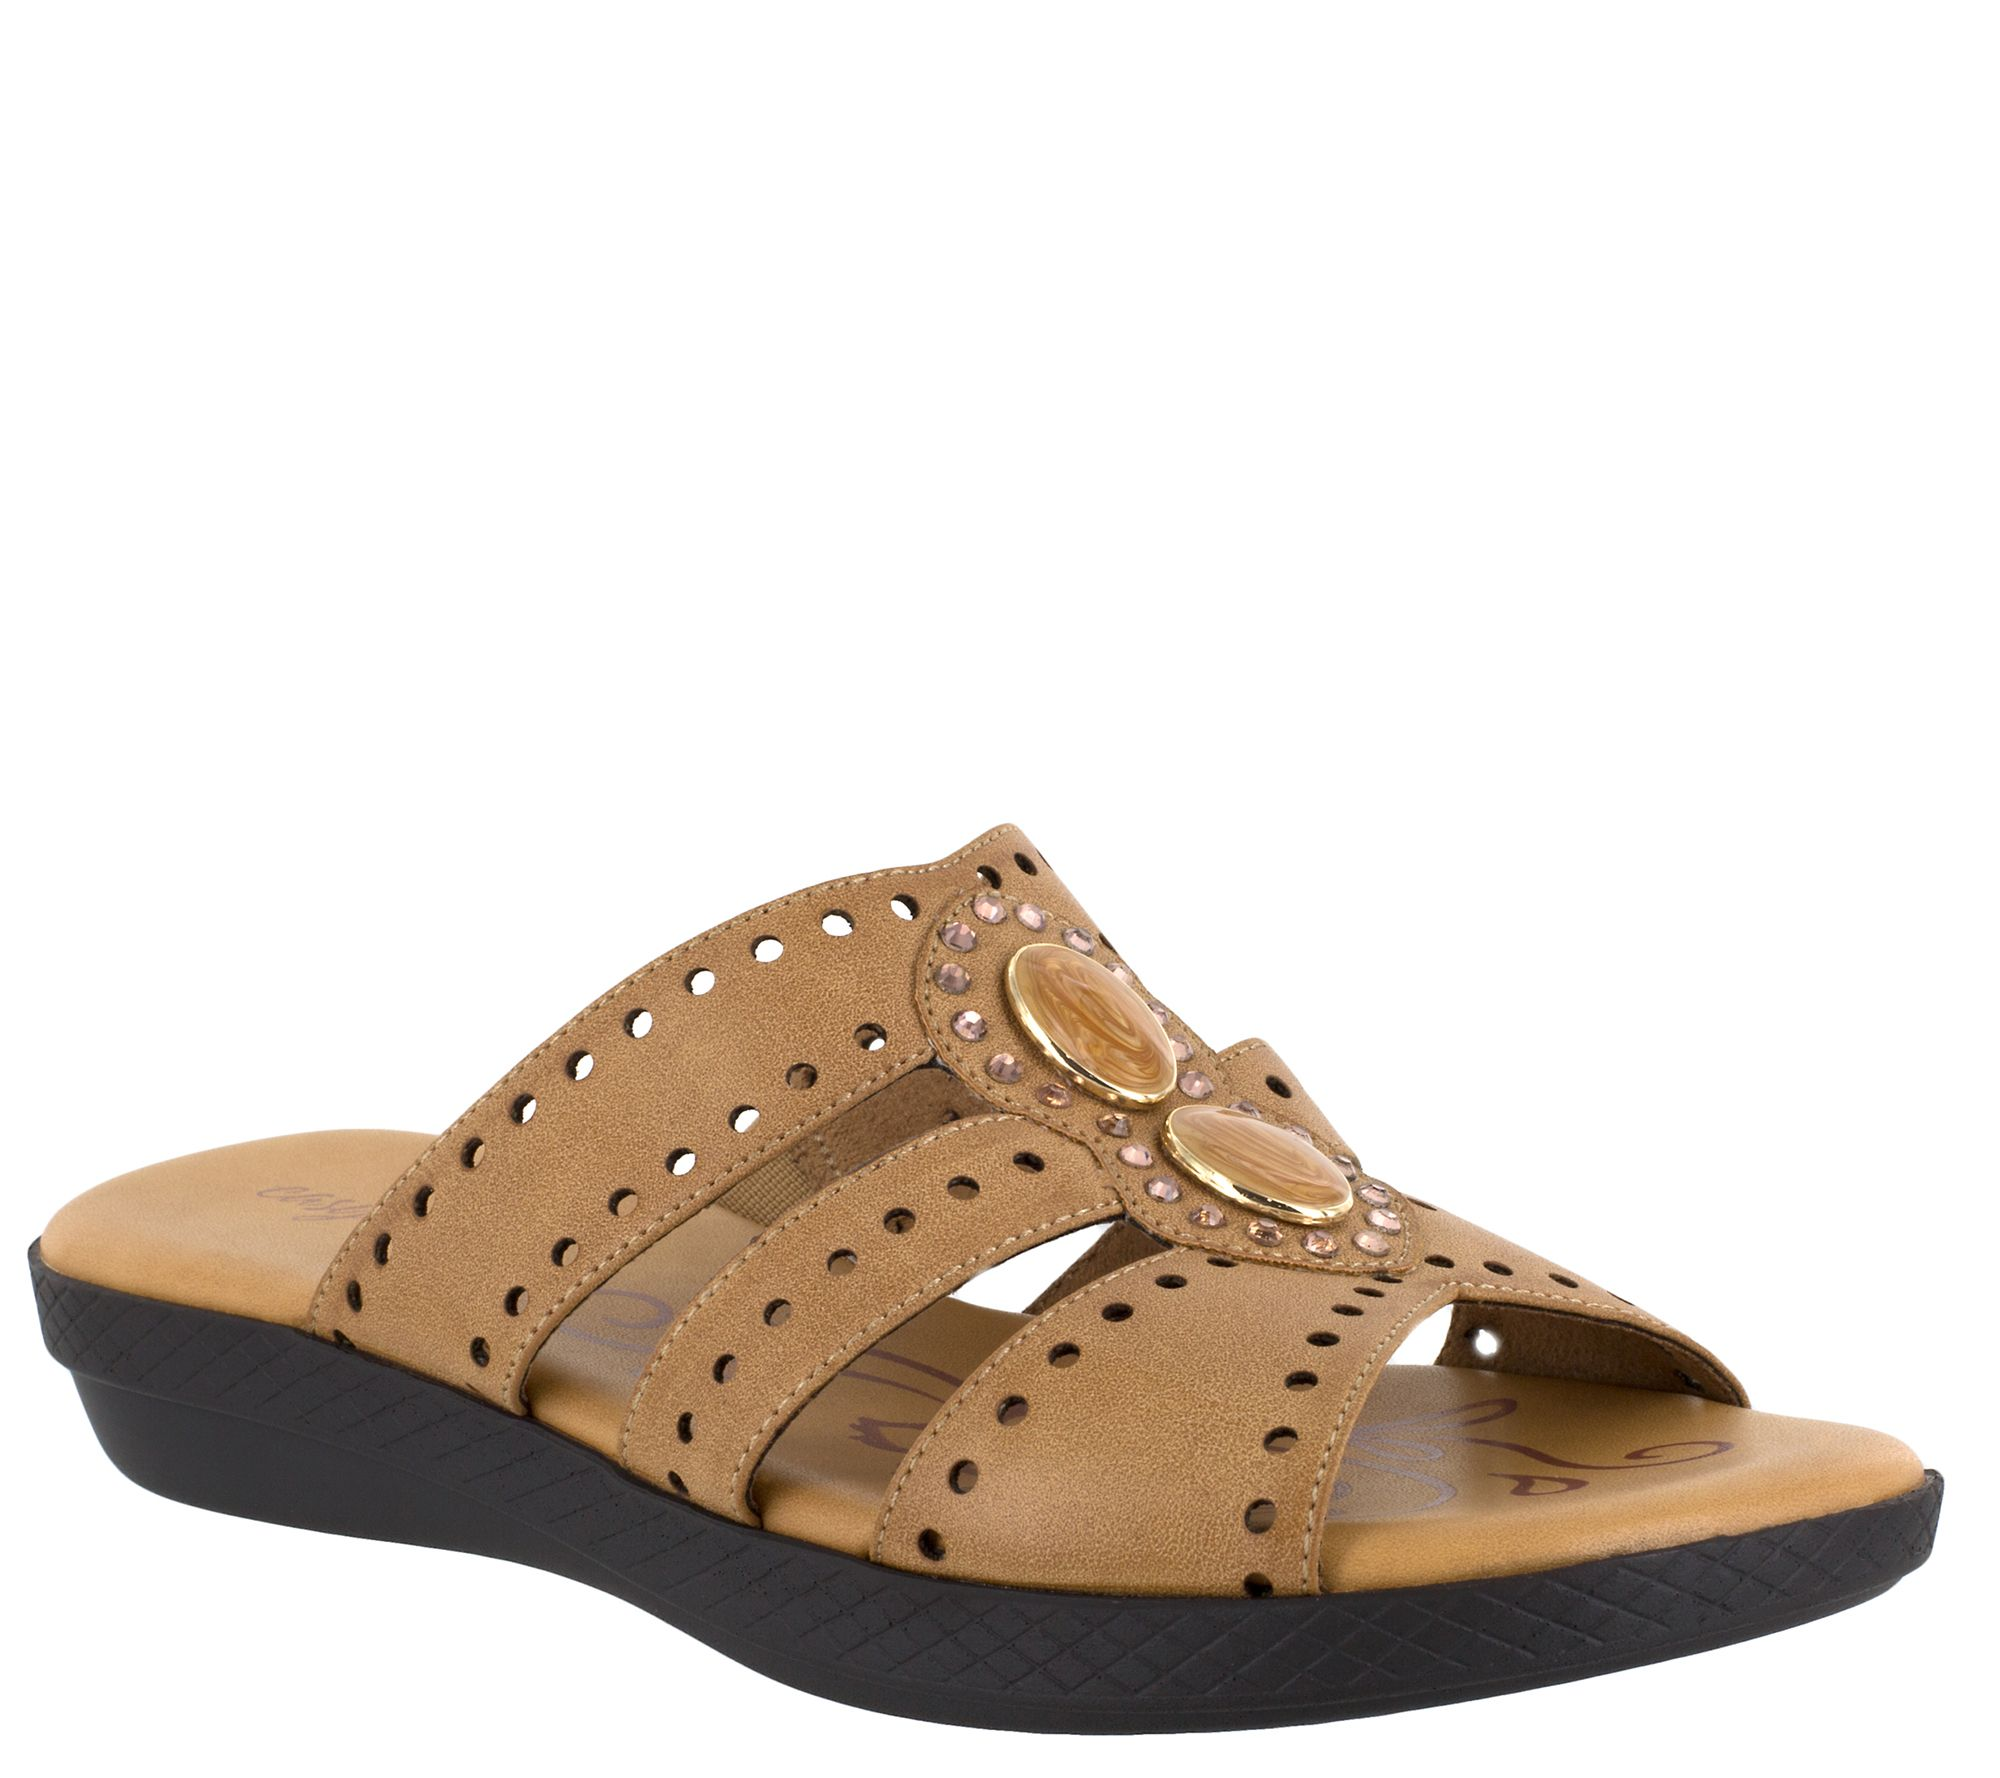 d56ff4035e9 Easy Street Jeweled Slip-On Sandals - Vara — QVC.com